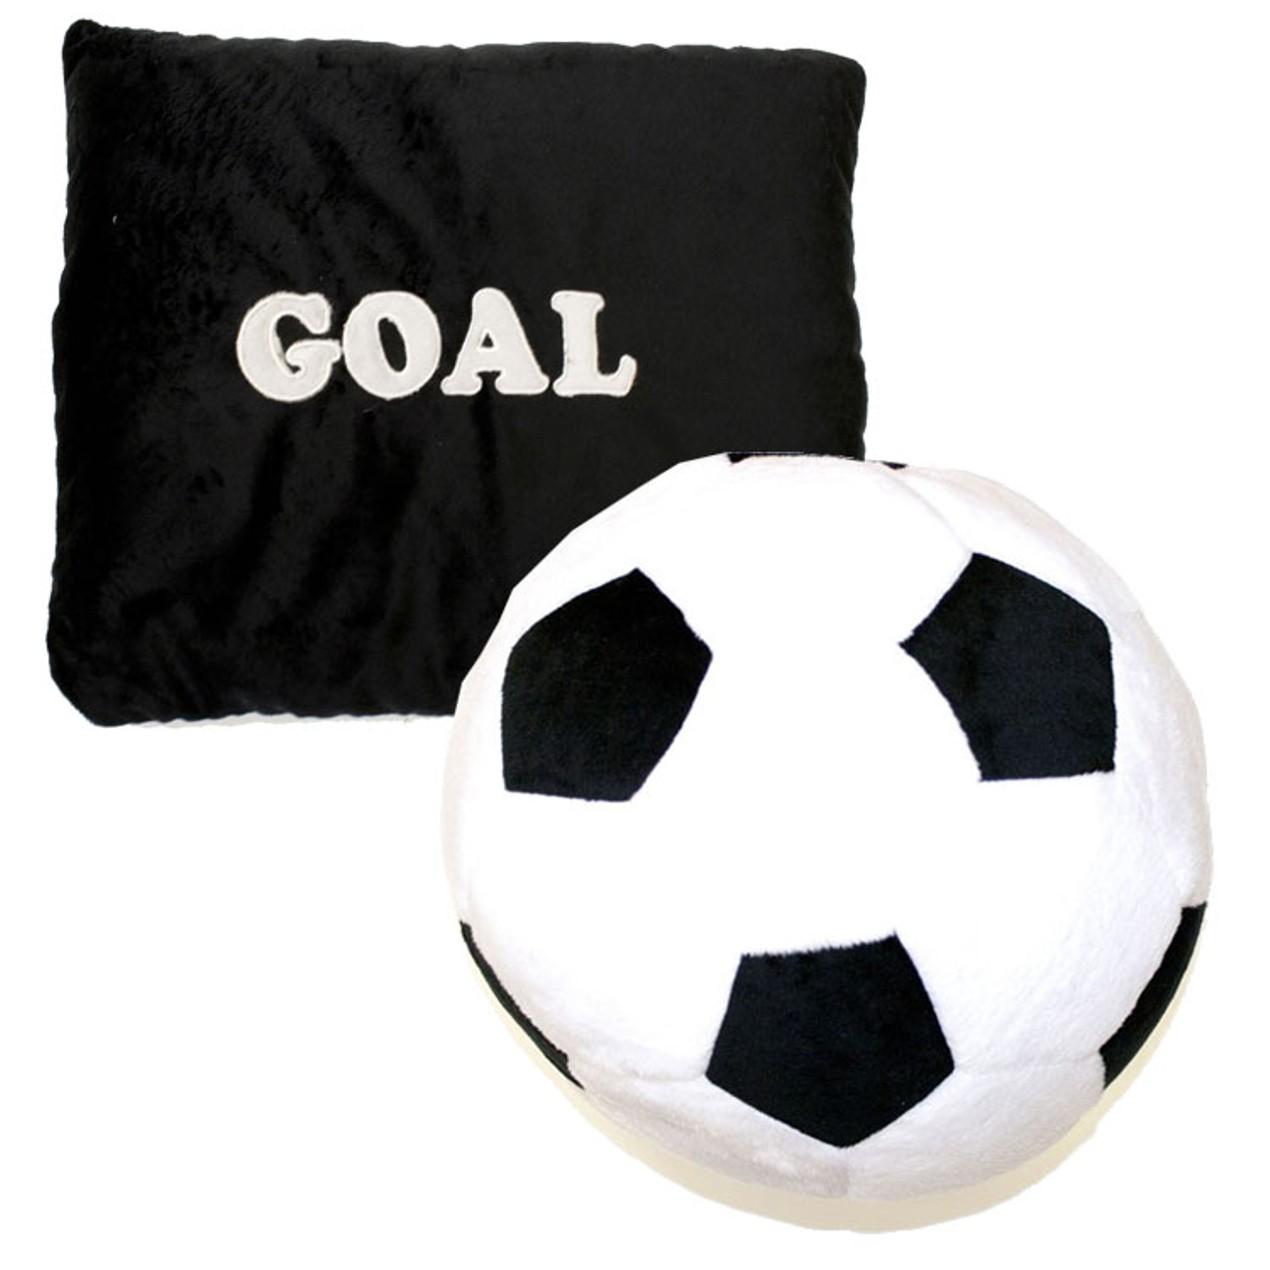 Goal Soccer Ball Plush Pillow